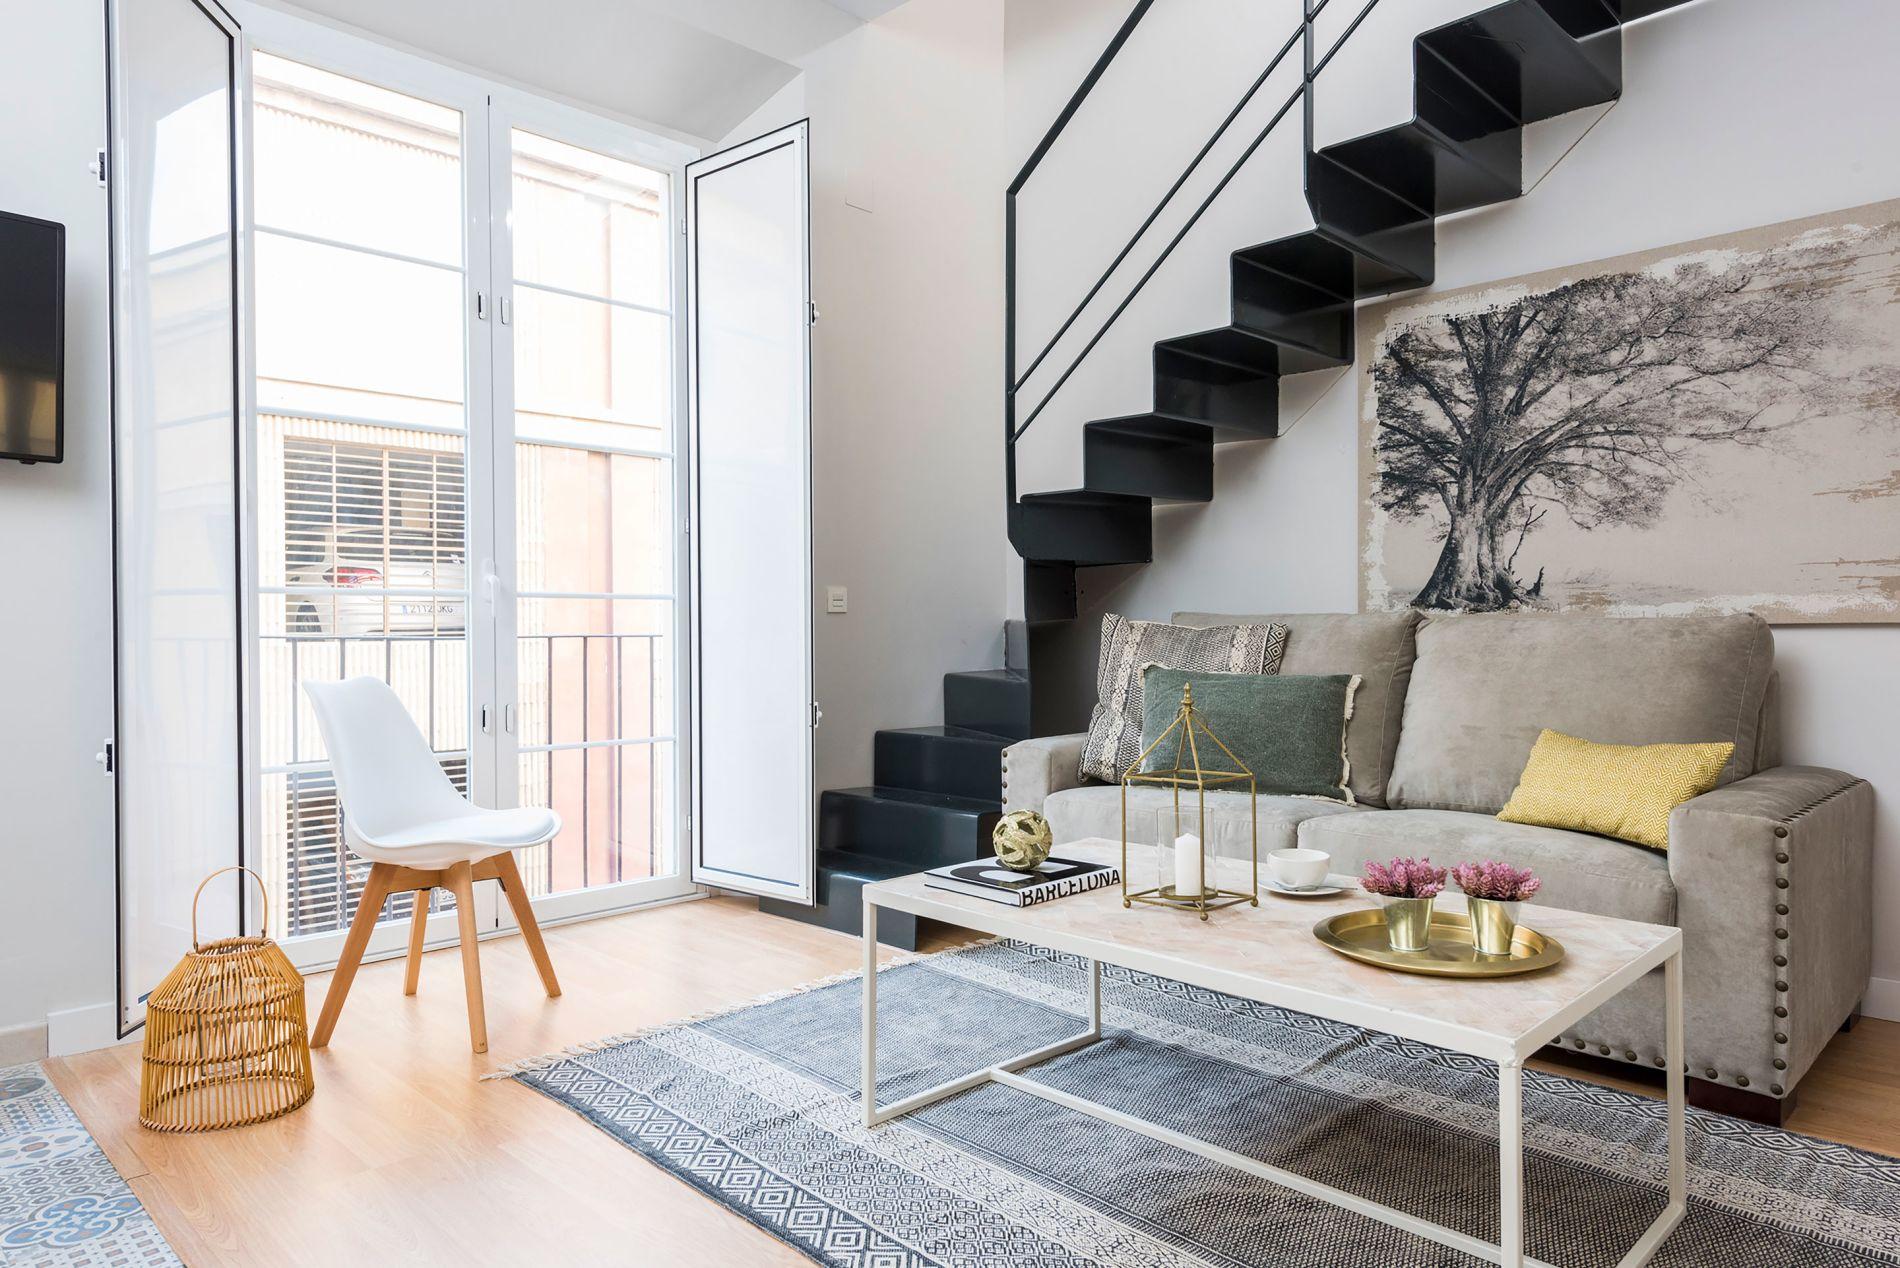 Pet-friendly apartment in prime location in Malaga